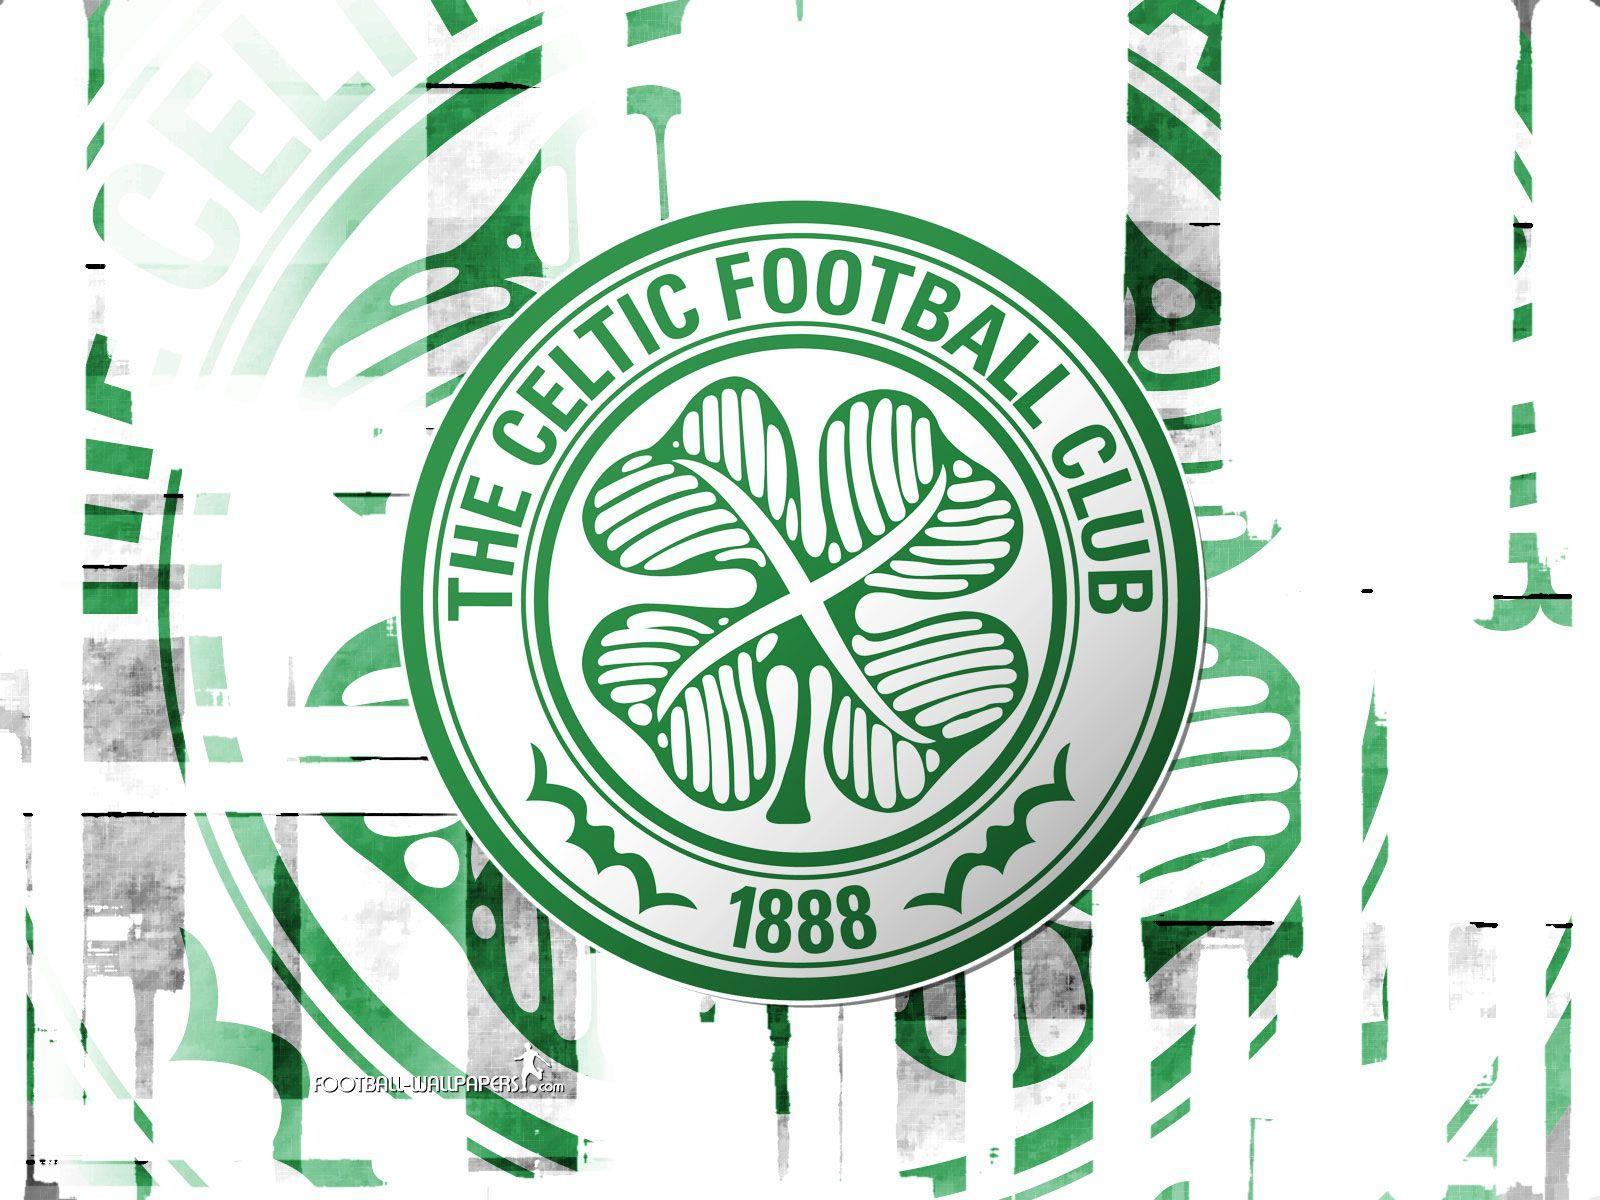 celtic fc - photo #2